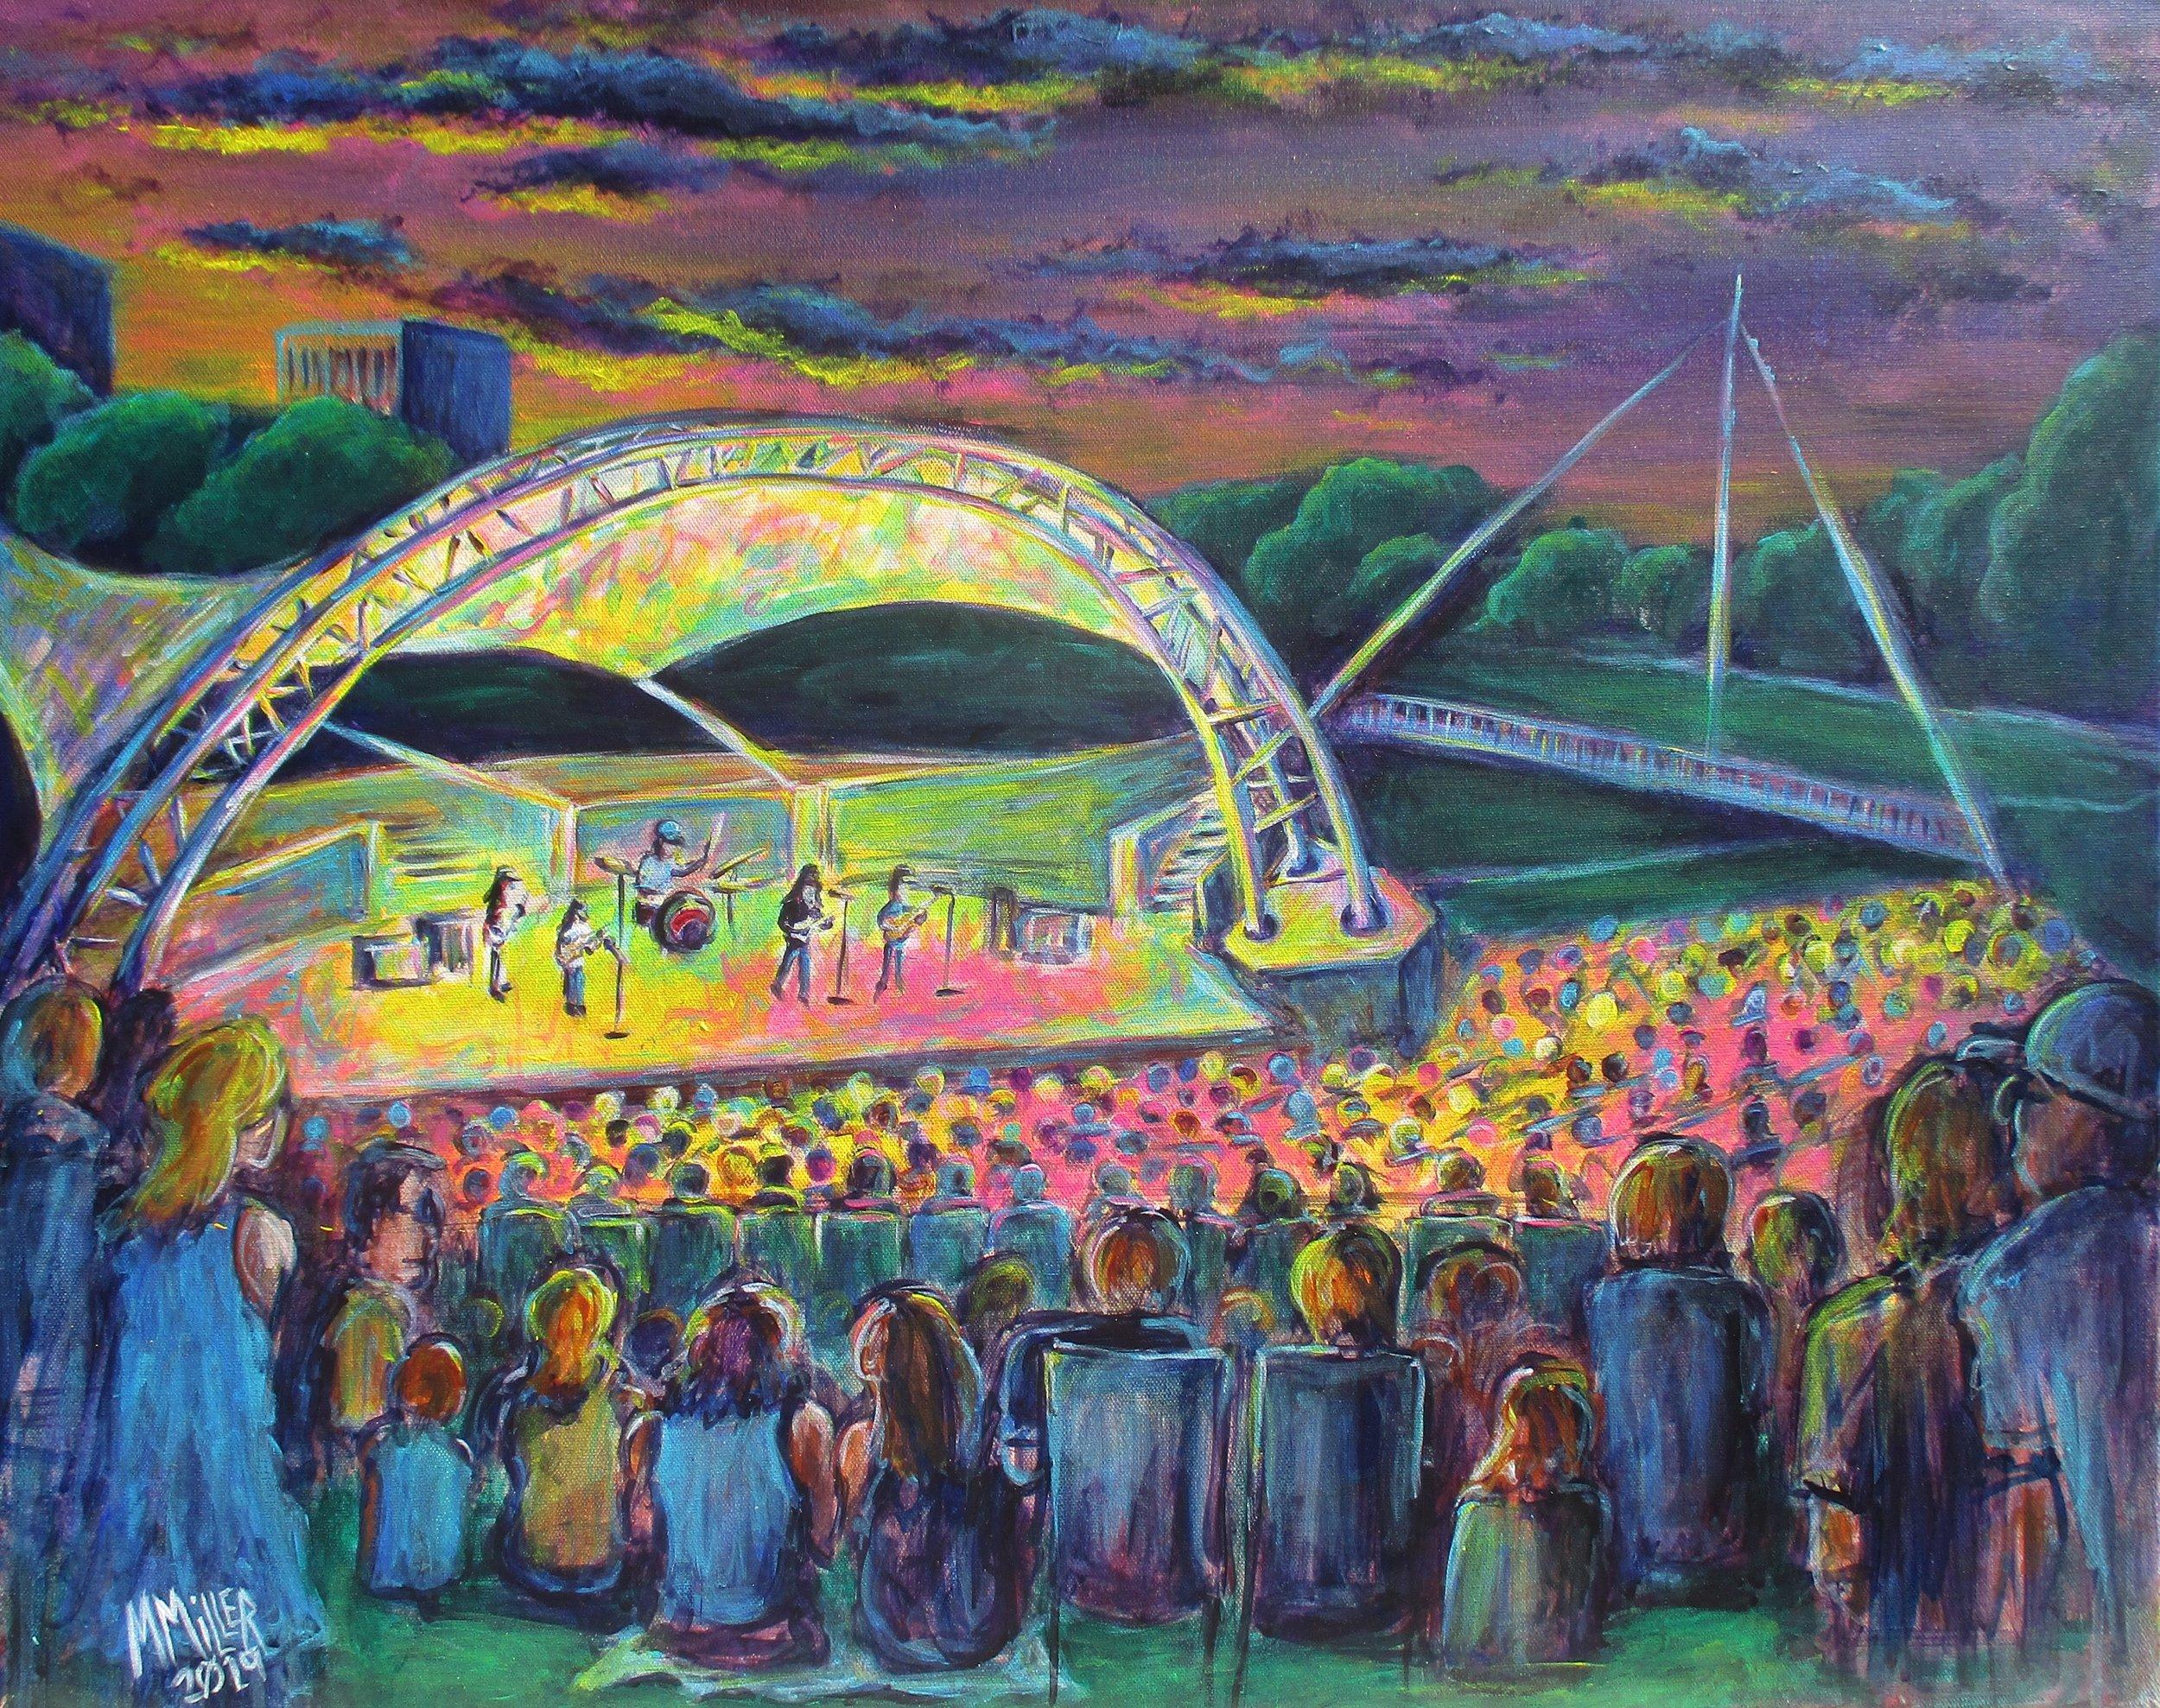 Tallahassee Downtown Sundown Concert, June 2019